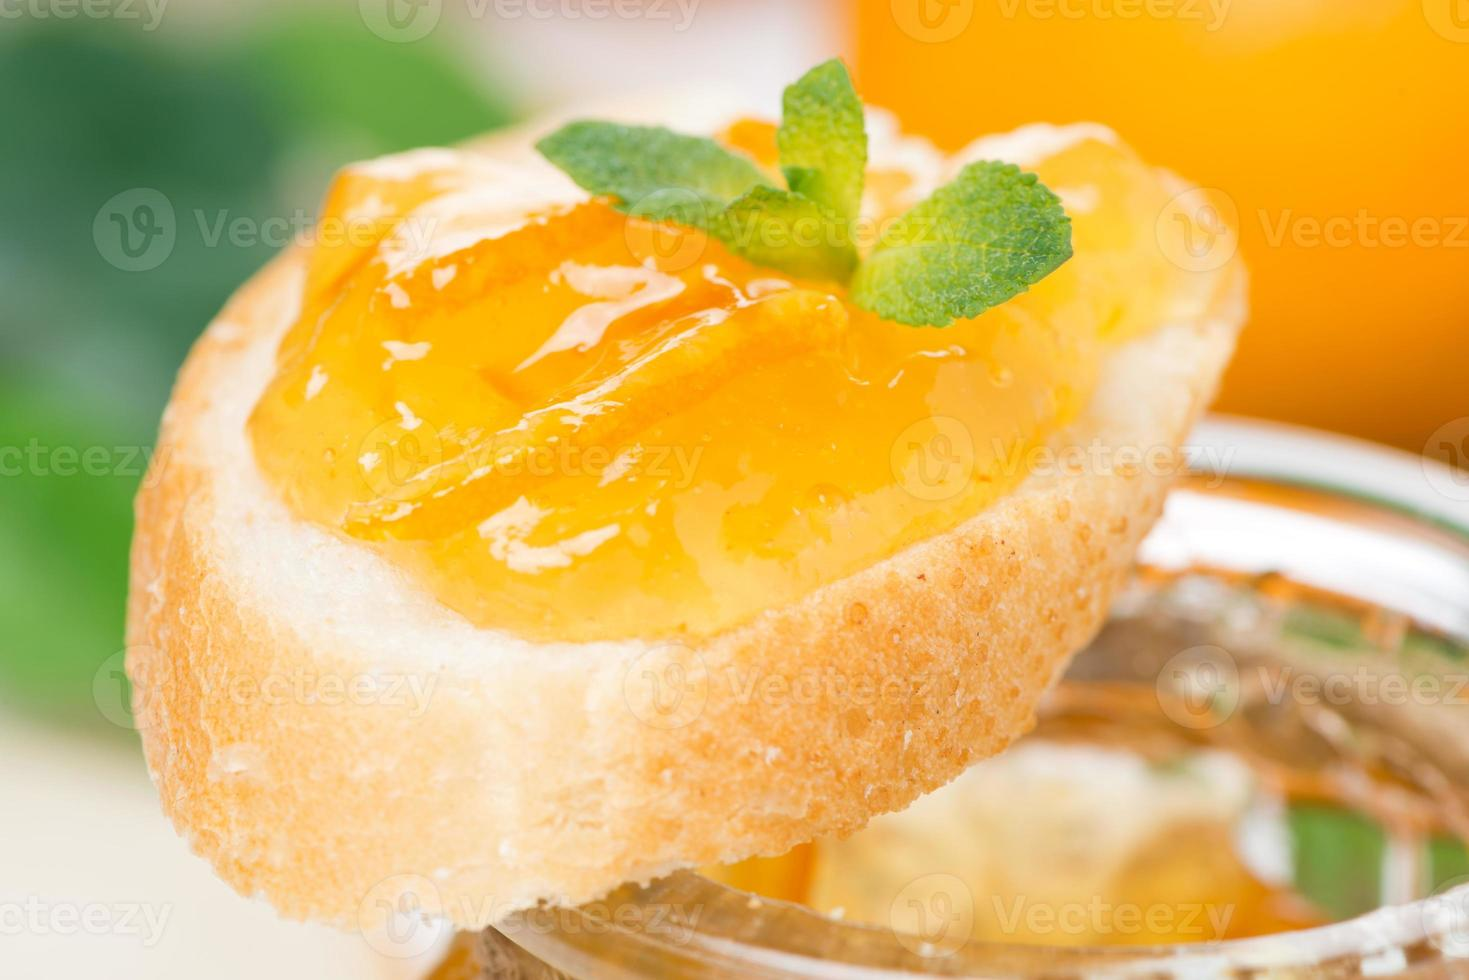 pedaço de baguete com geléia de laranja, close-up foto